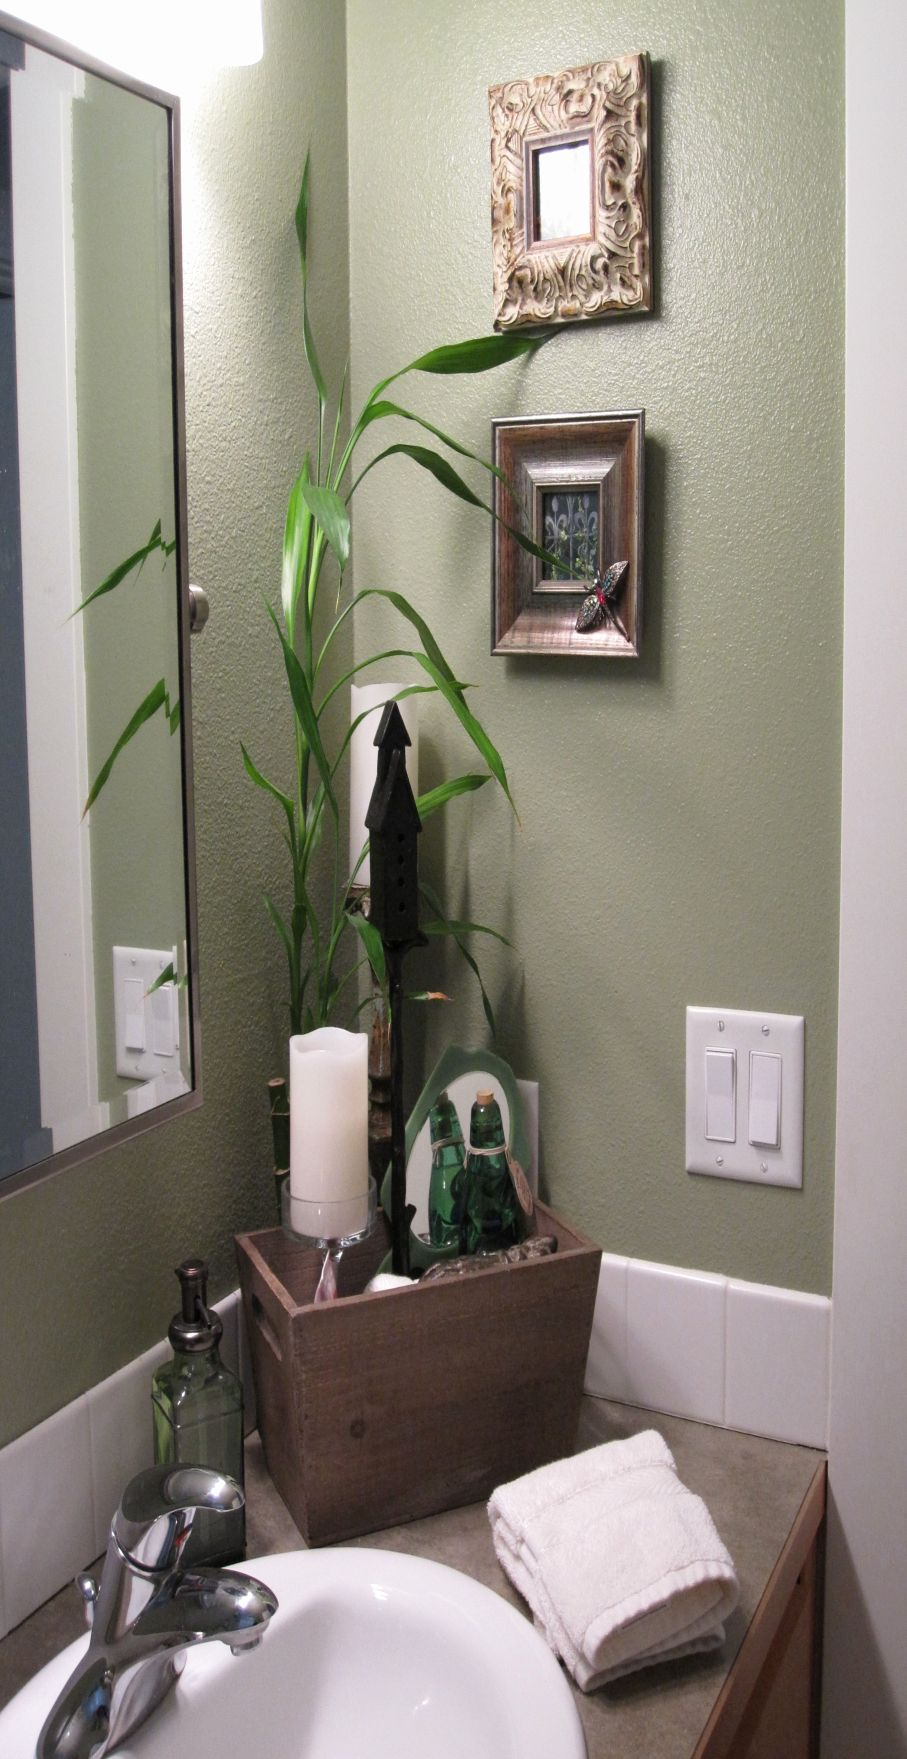 47 Beautiful Spa Bathroom Decorating Ideas | Green ...